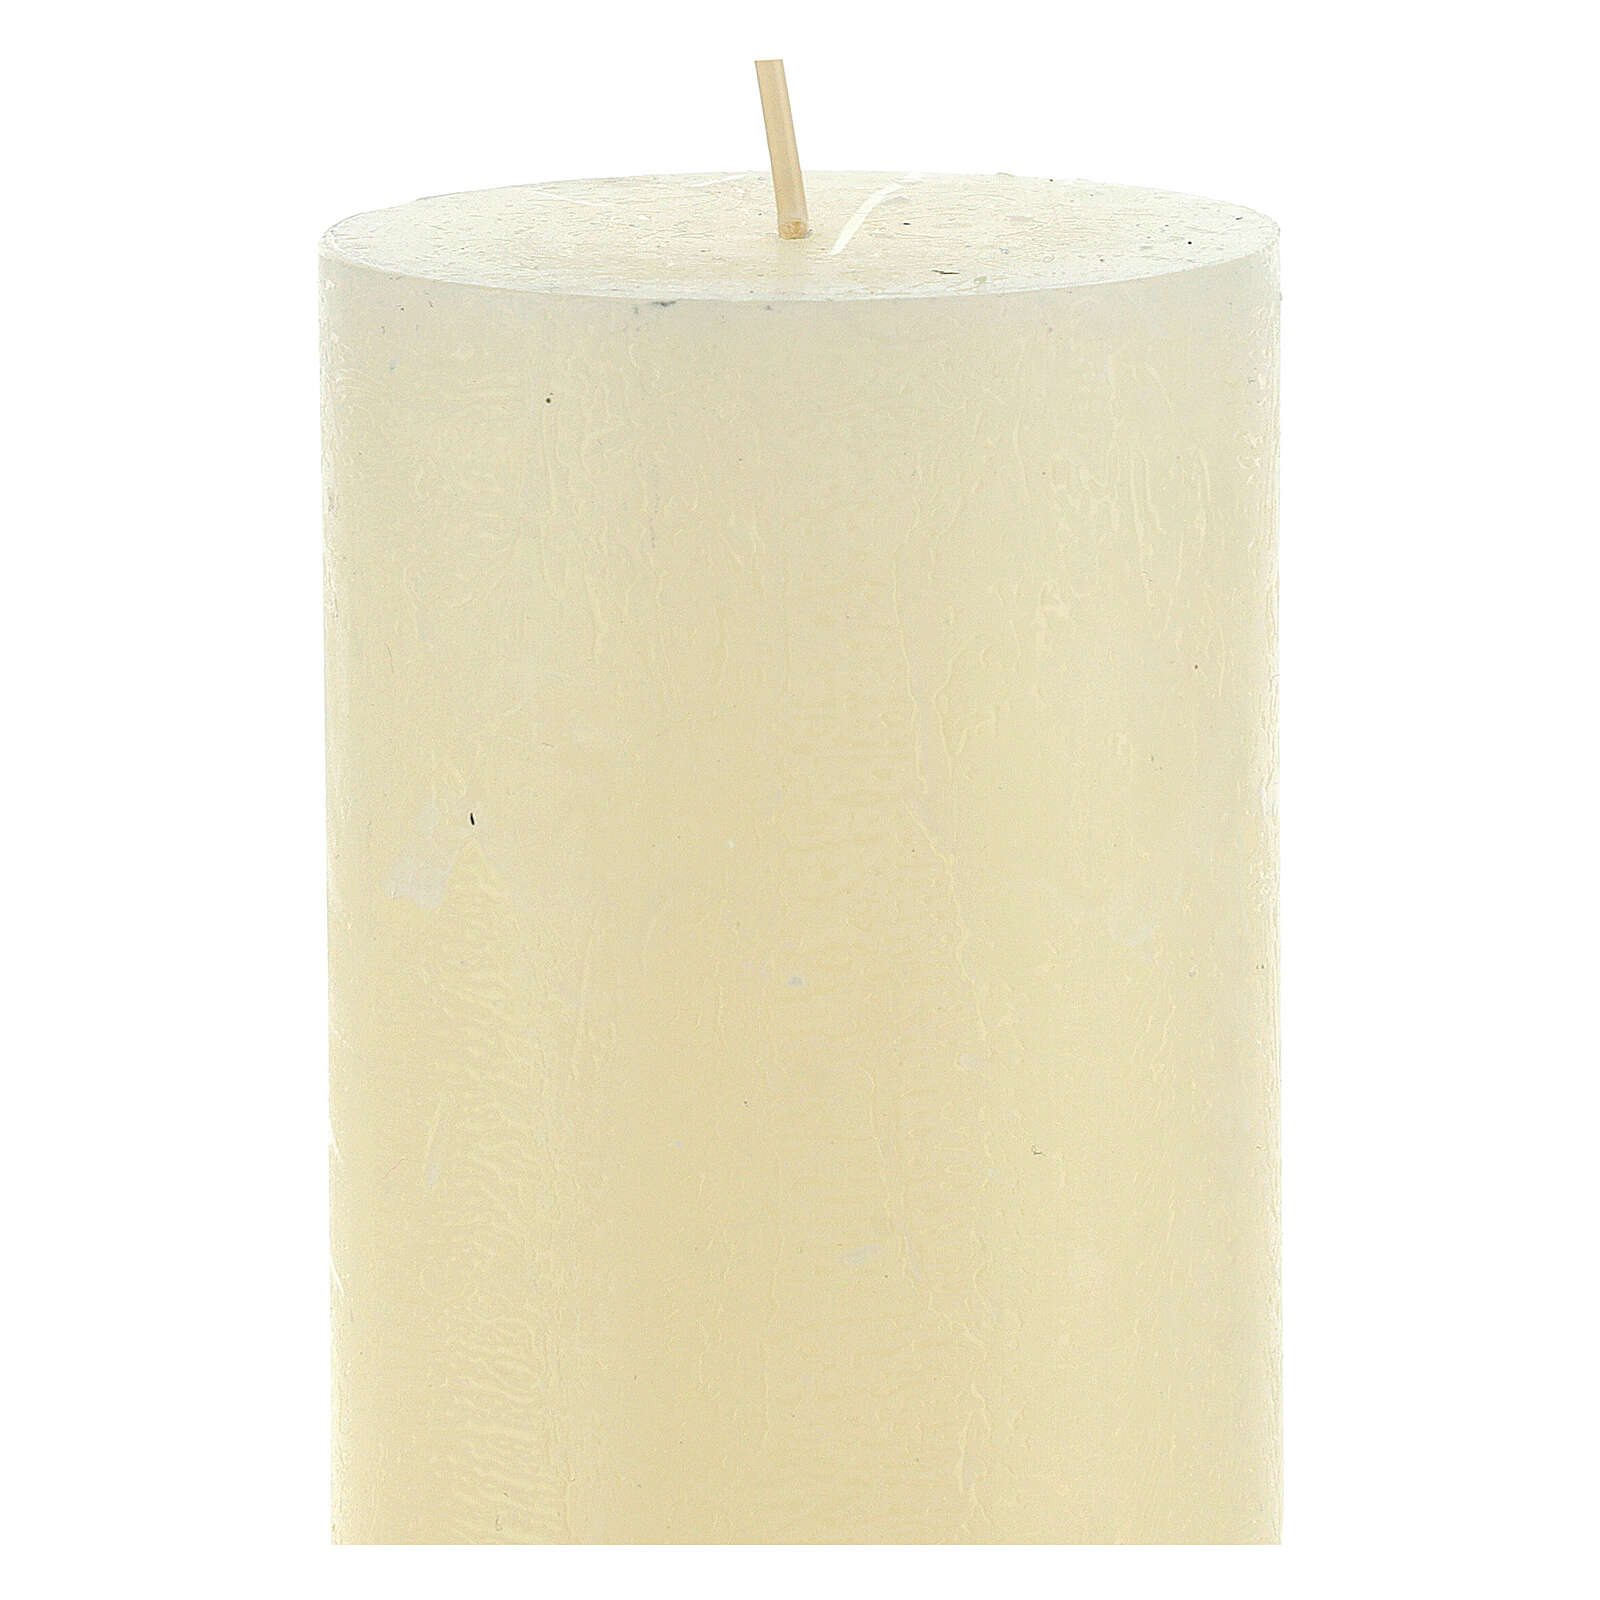 Kerzen elfenbeinfarben rustikaler Stil 4 Stück,170x70 mm 3